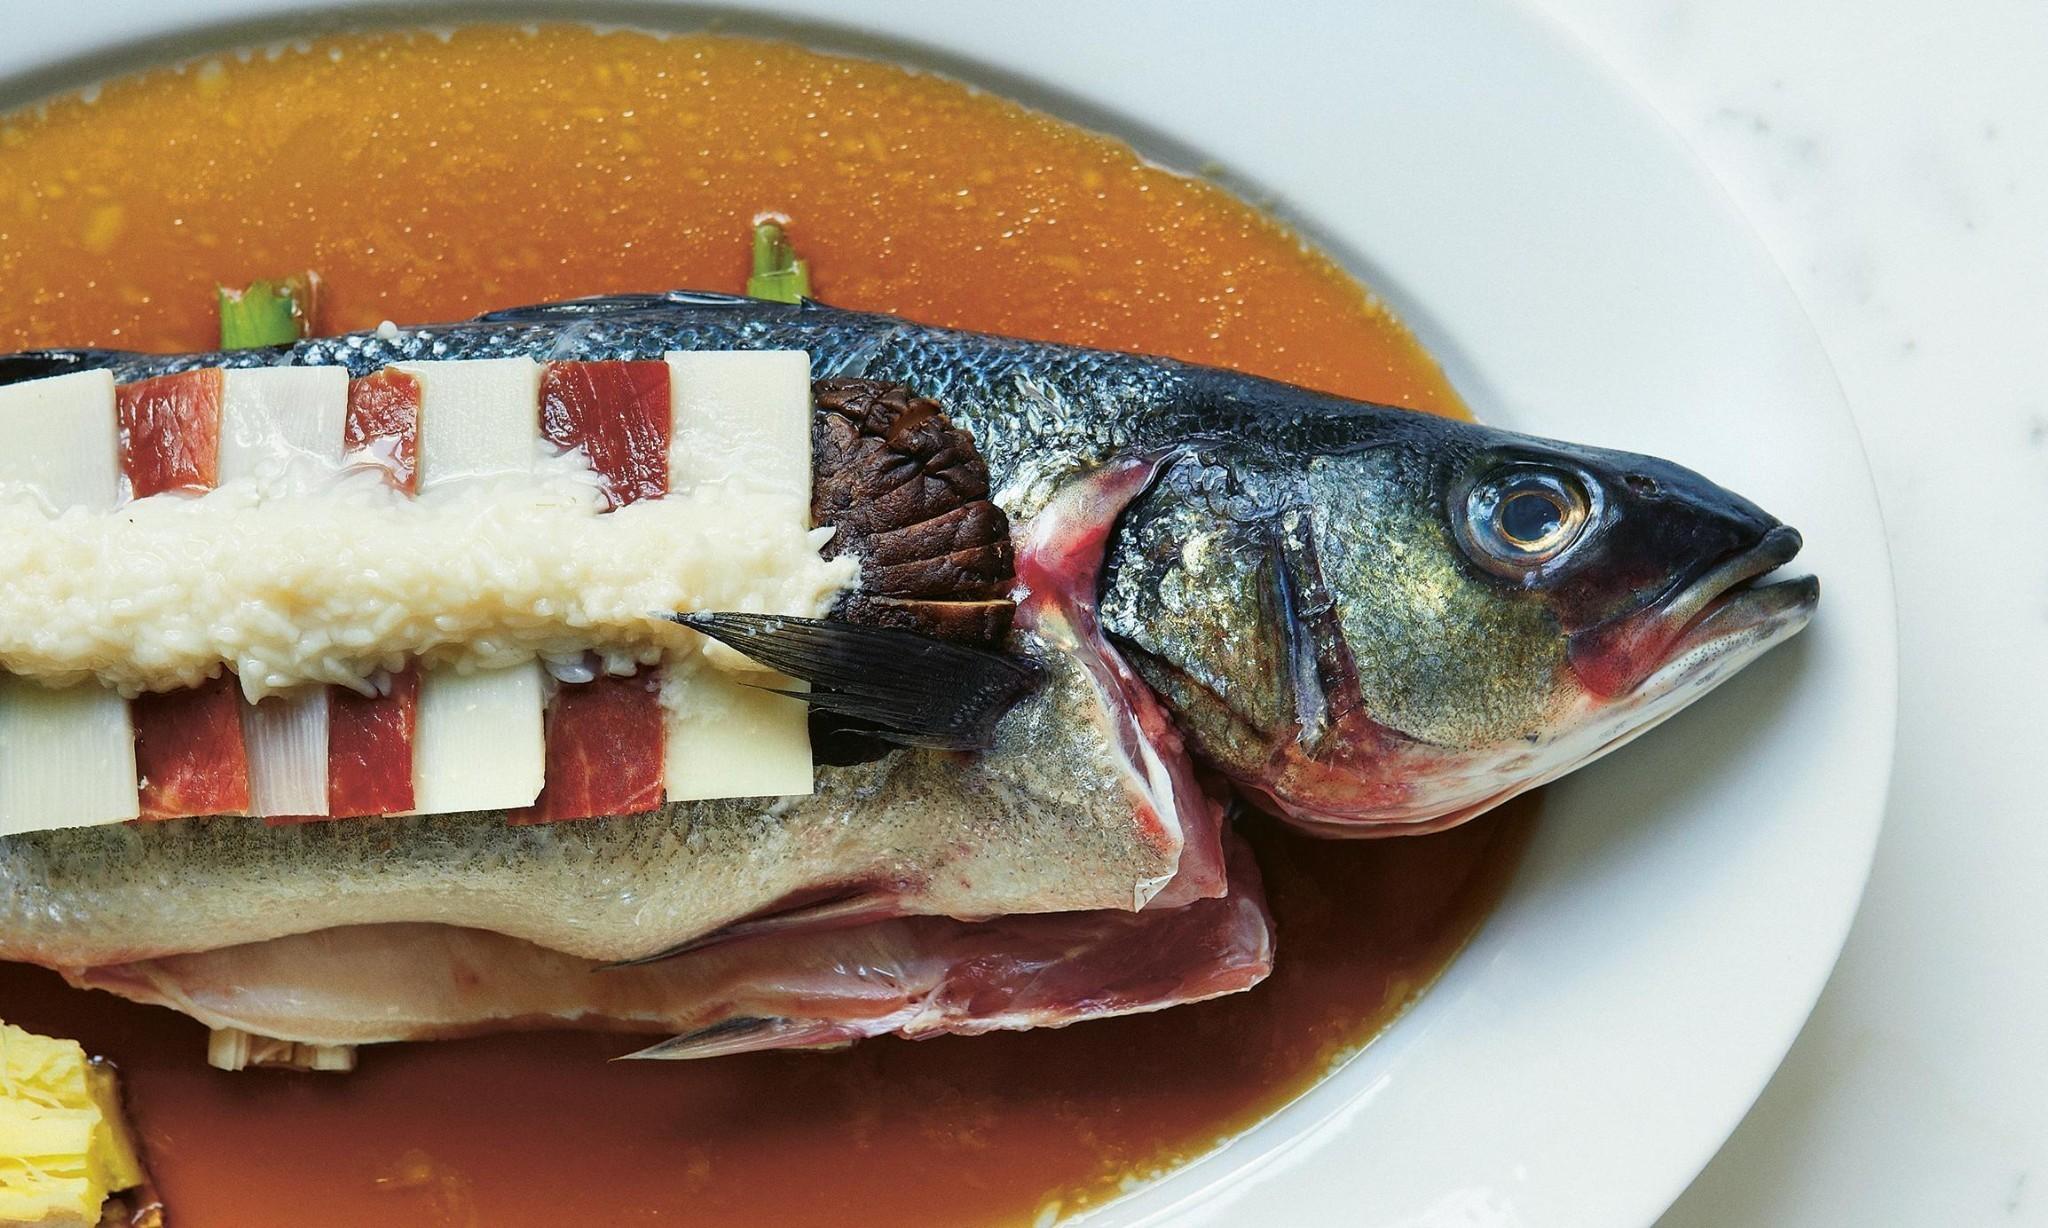 China's best-kept food secret, revealed by Fuchsia Dunlop